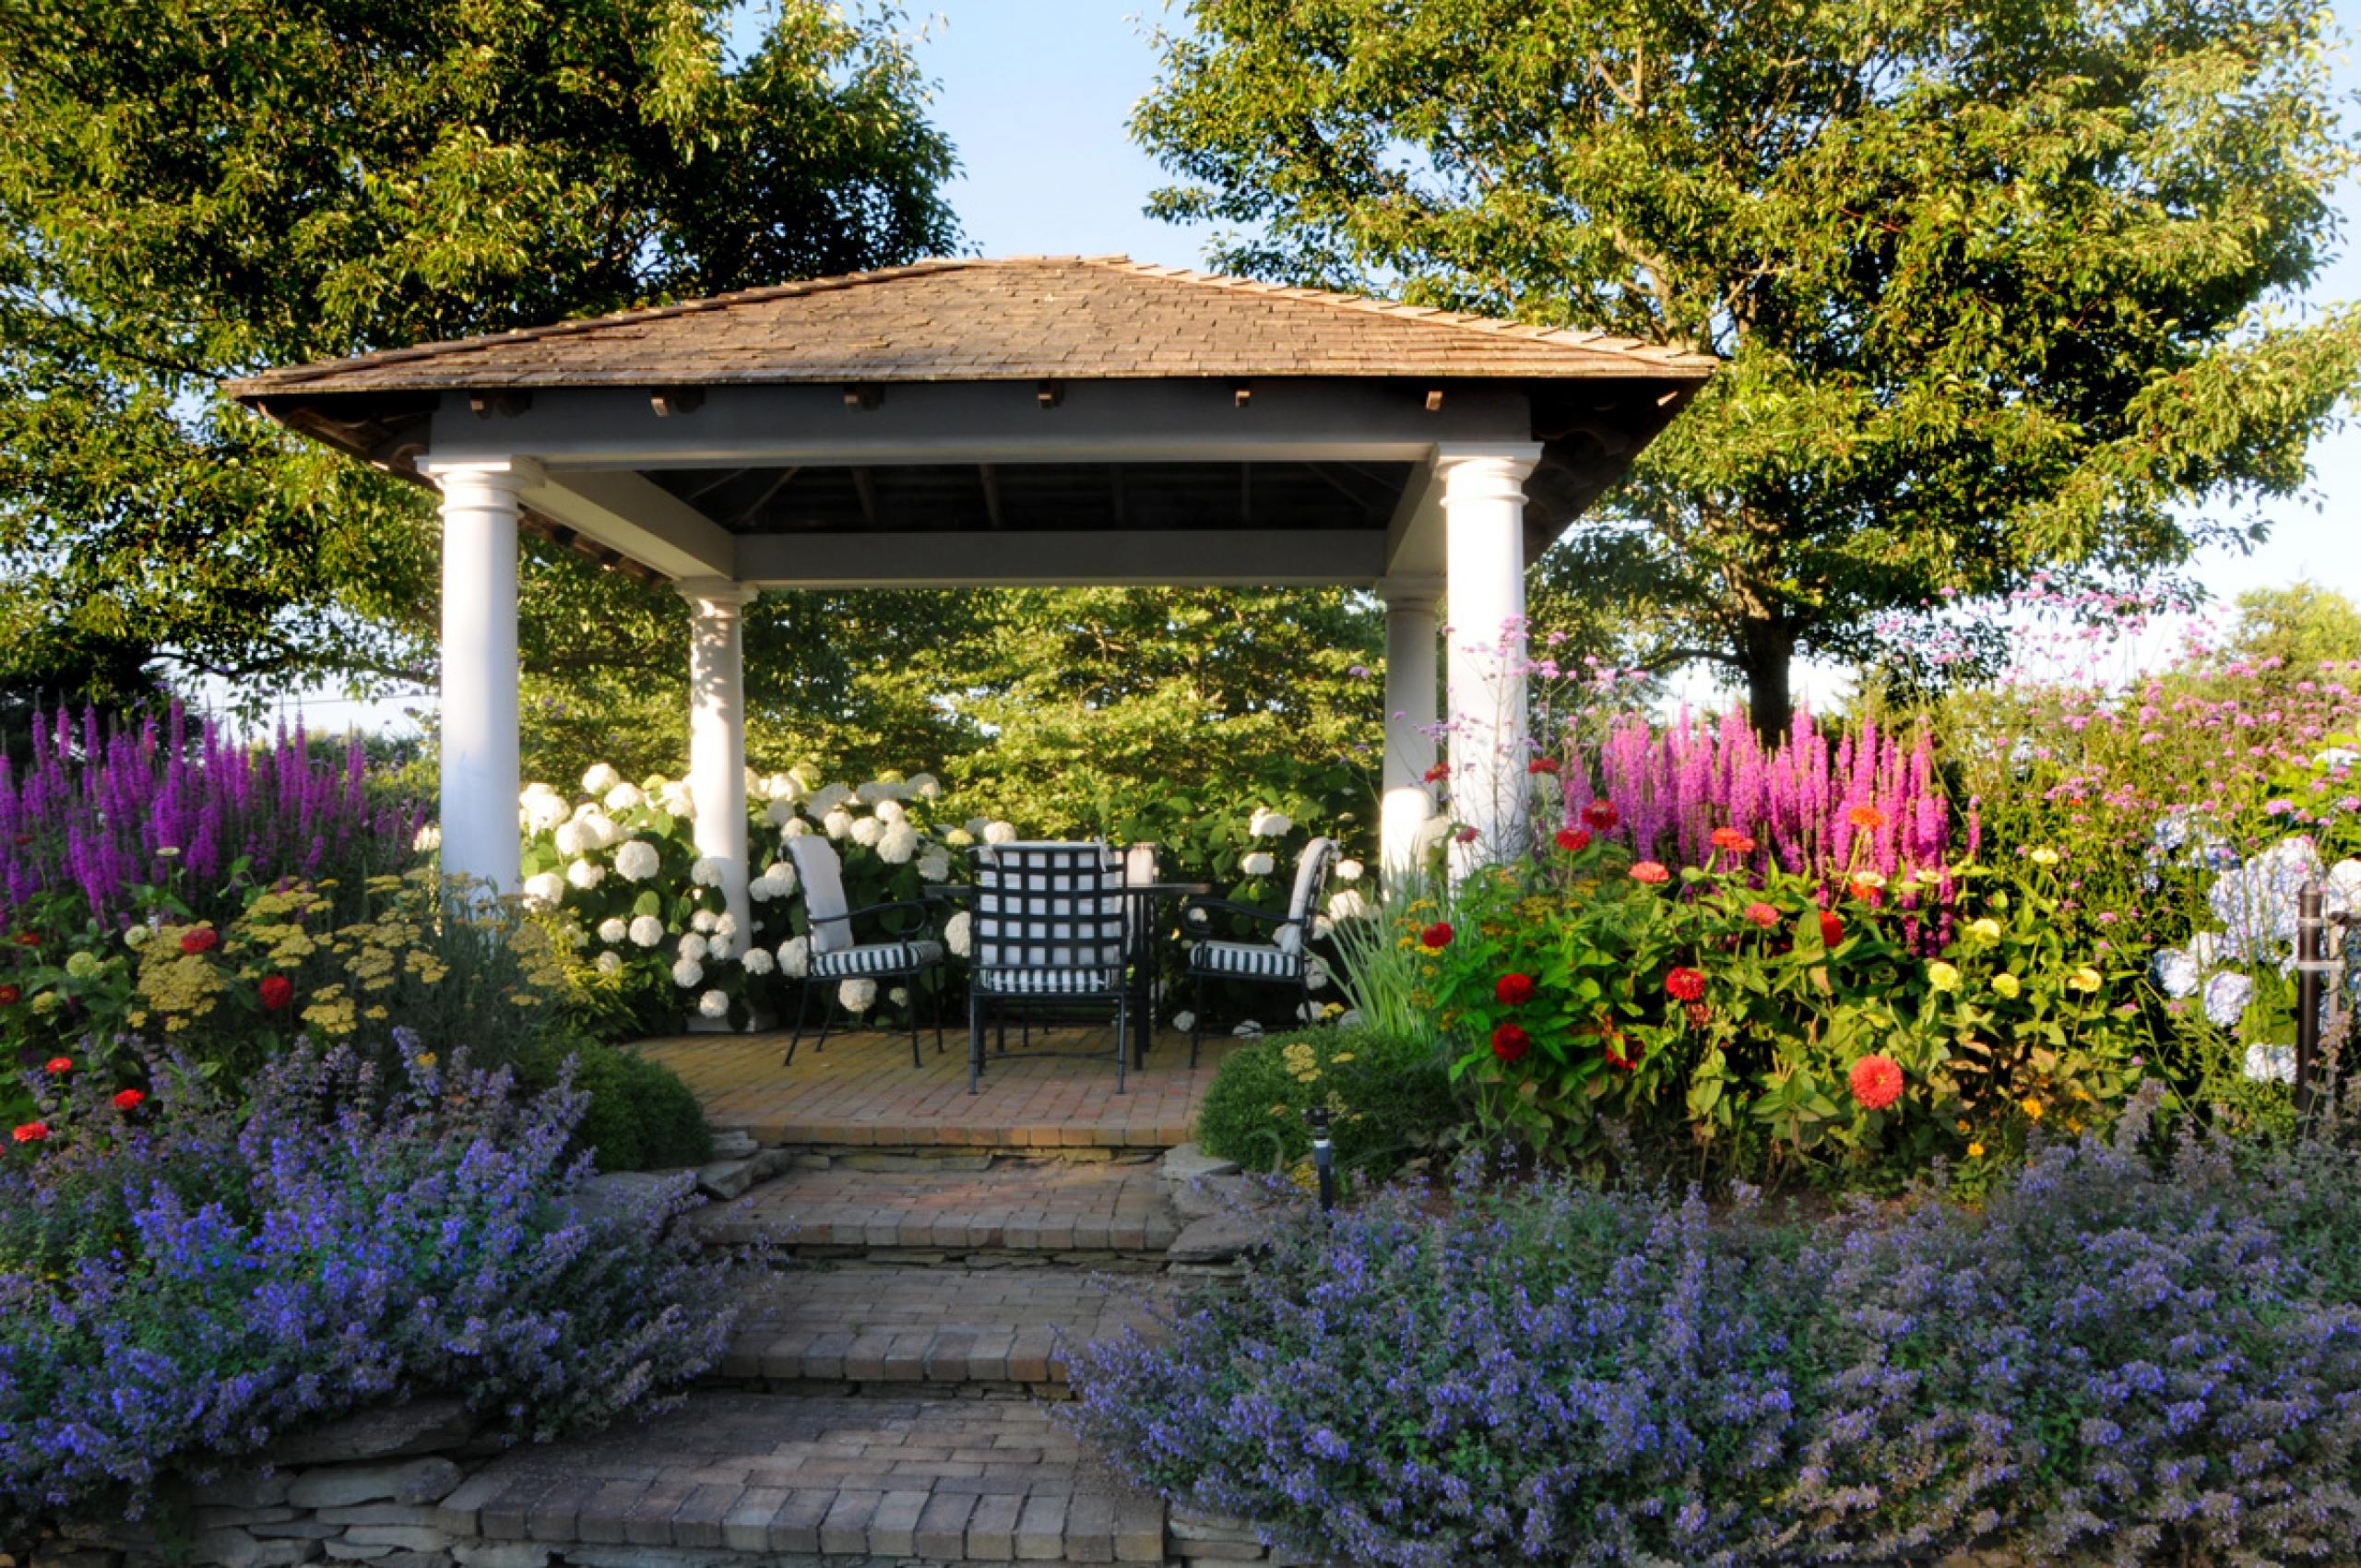 Landscape U0026 Garden Design Services | Harmonia Inc.